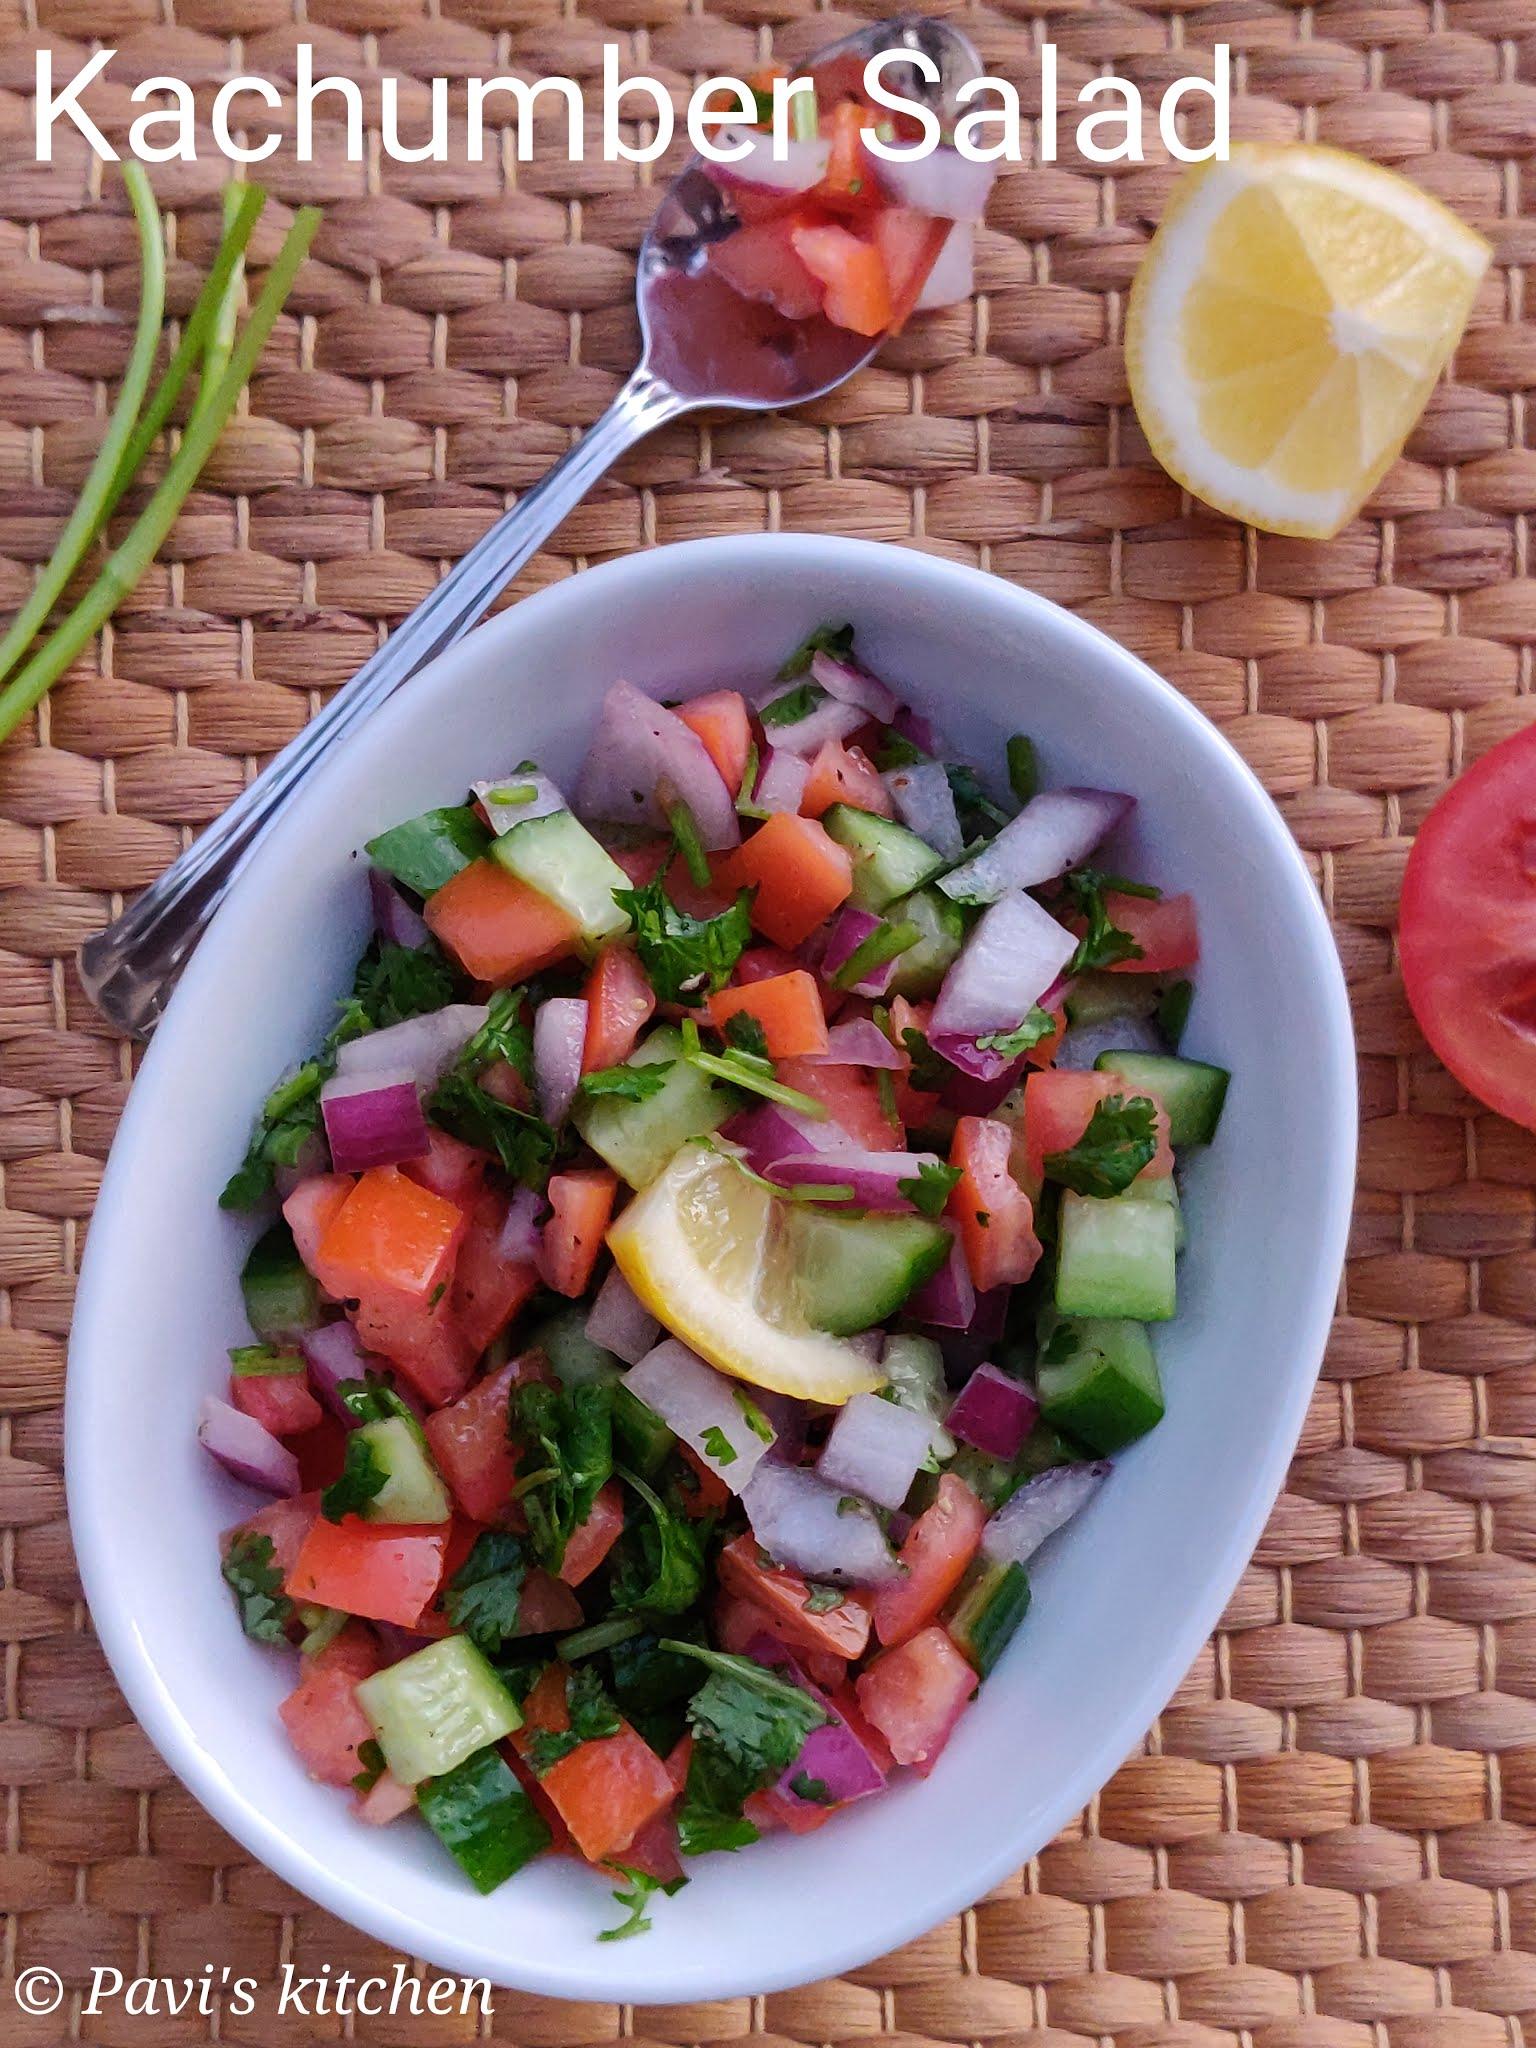 Kachumber salad recipe | Indian kachumber salad | Cucumber tomato onion salad recipe